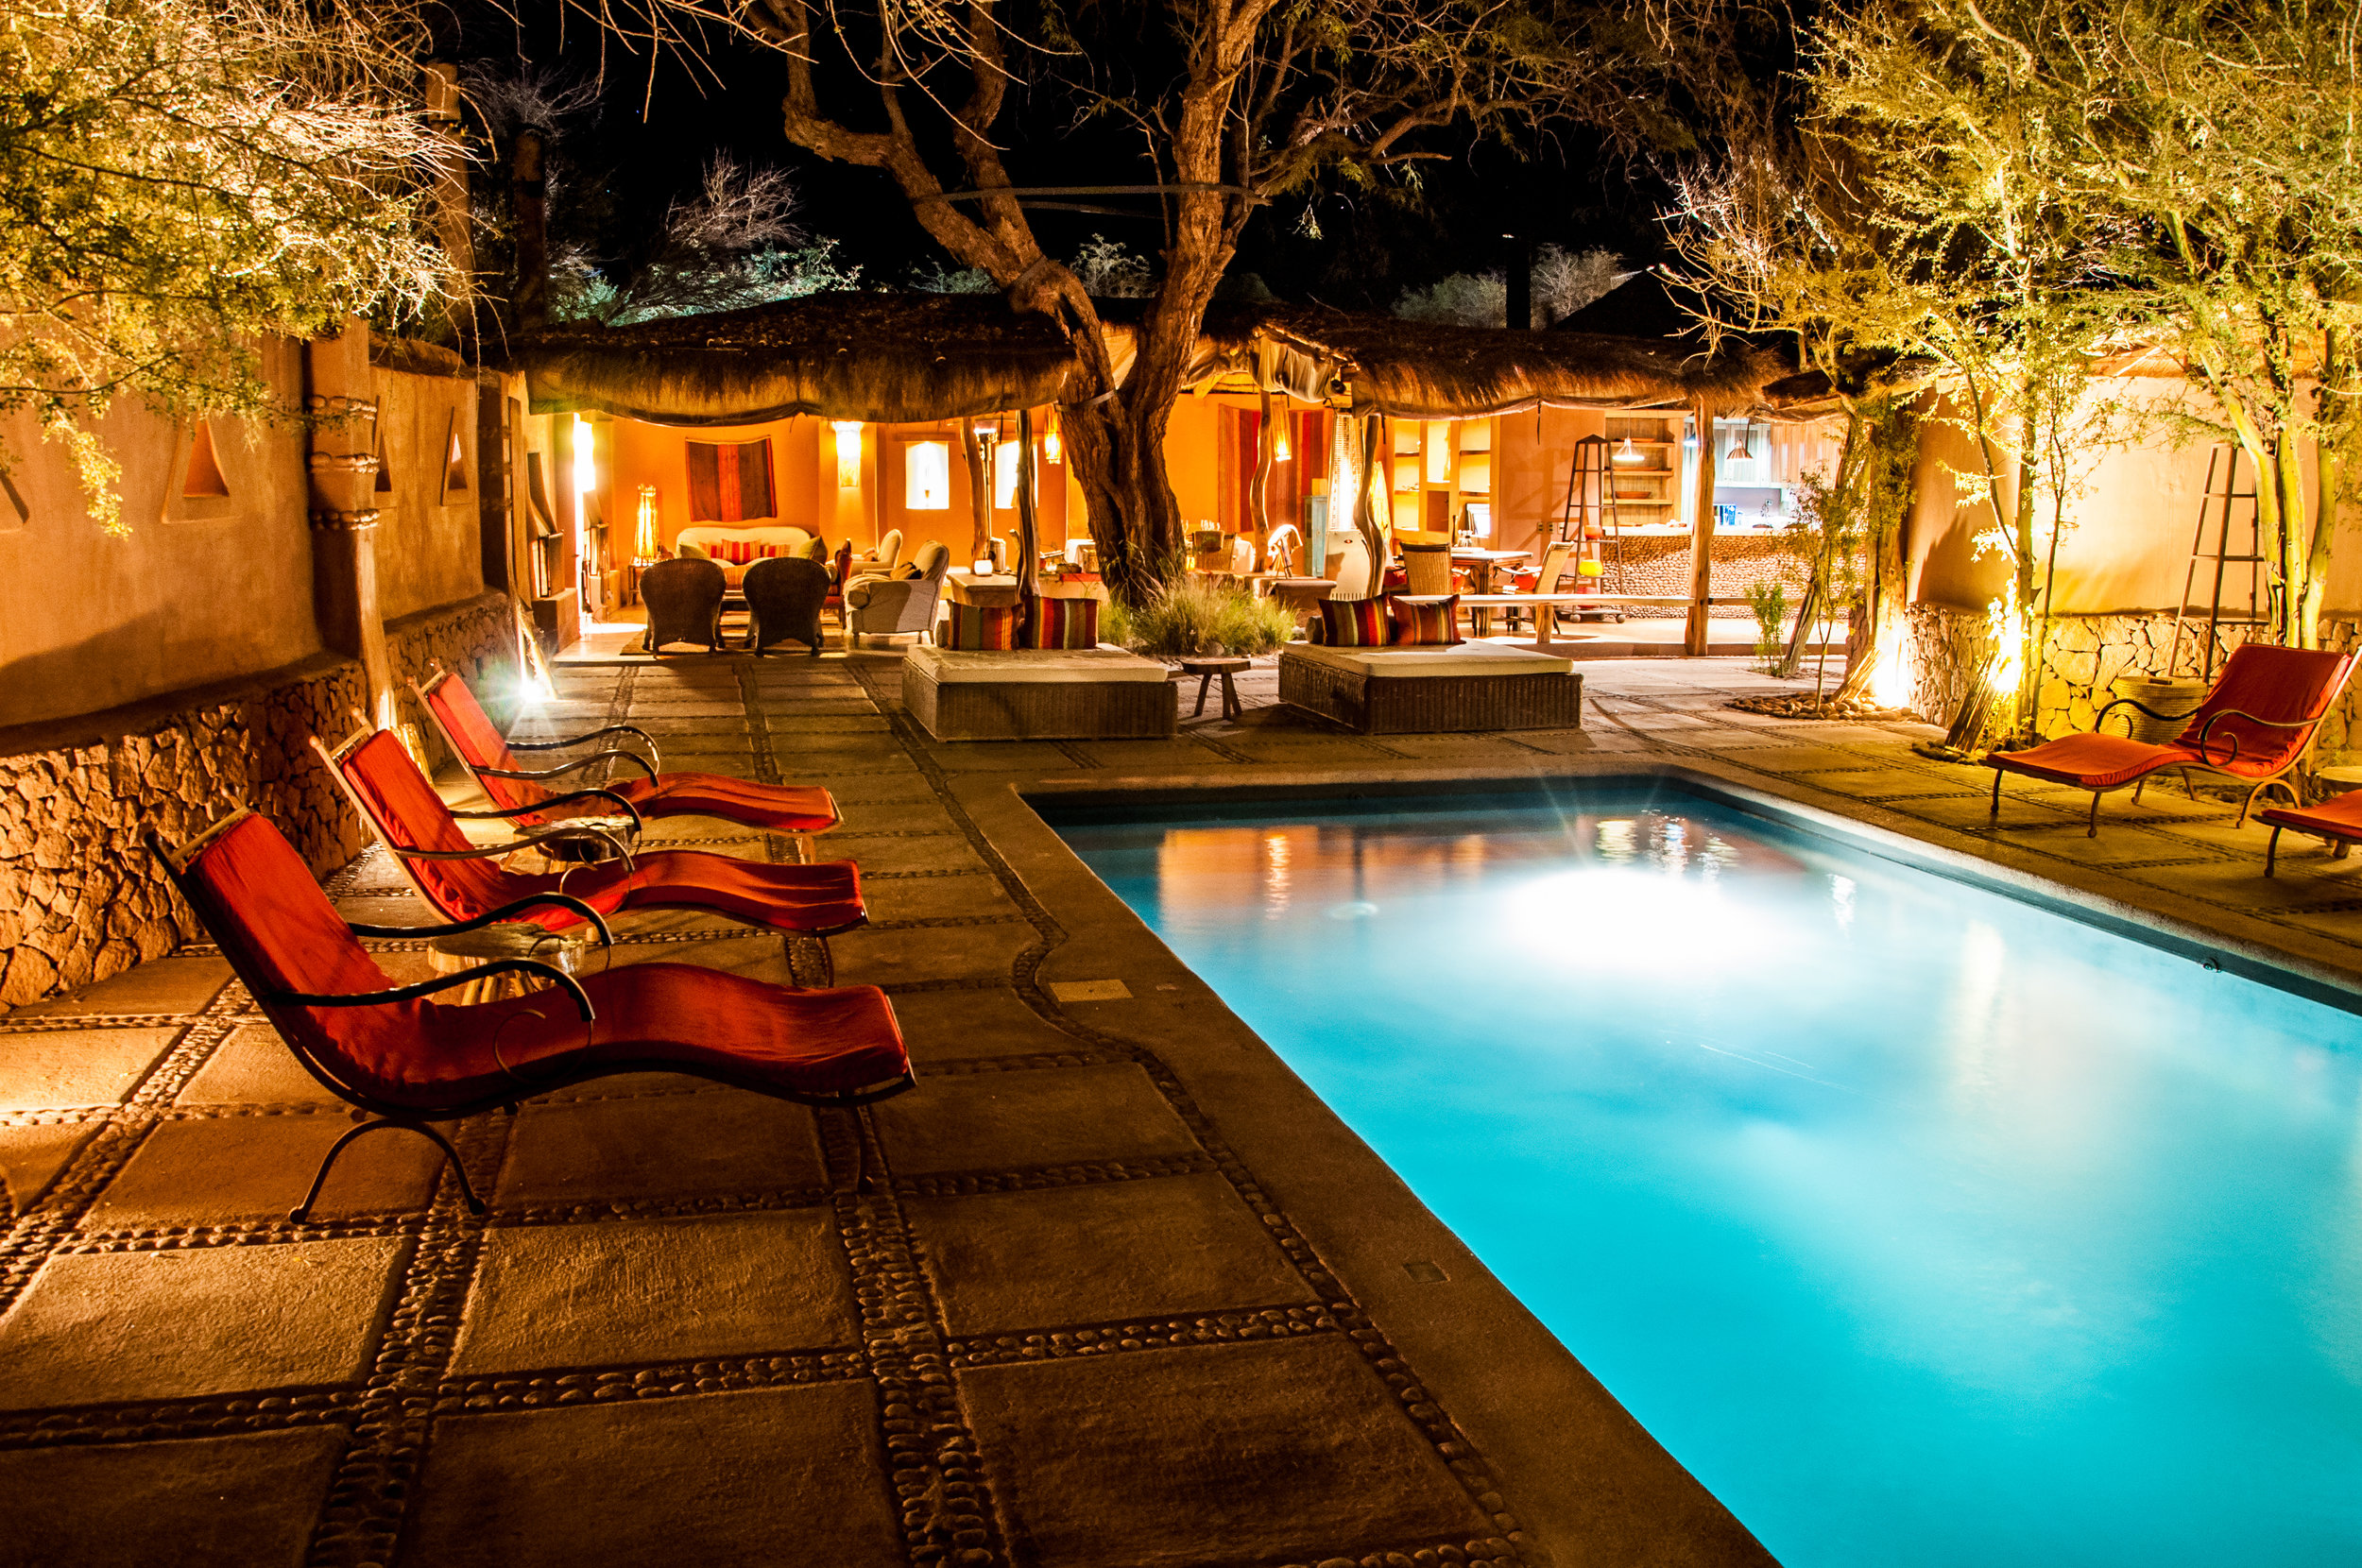 Outdoor Lounge by the Pool at Awasi Atacama, Chile